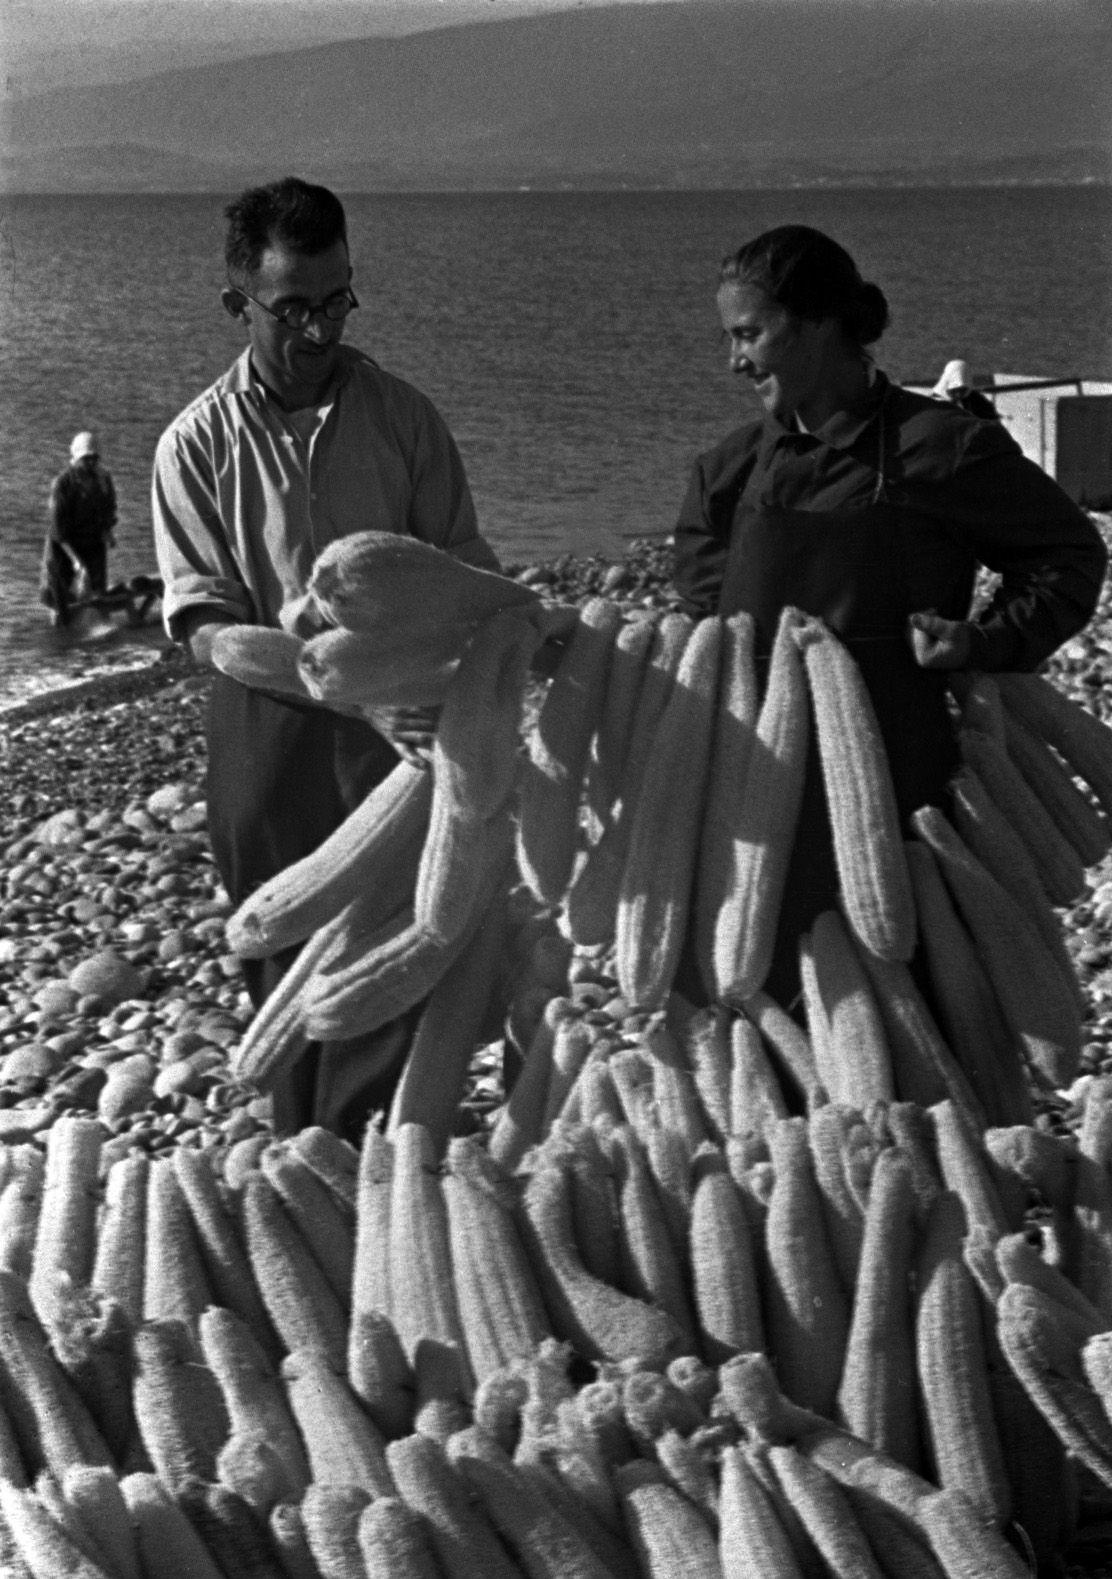 Loofah sponge seller, 1938. Black Sea coast. Sukhumi. Abkhazia-Georgia, ex-USSR.